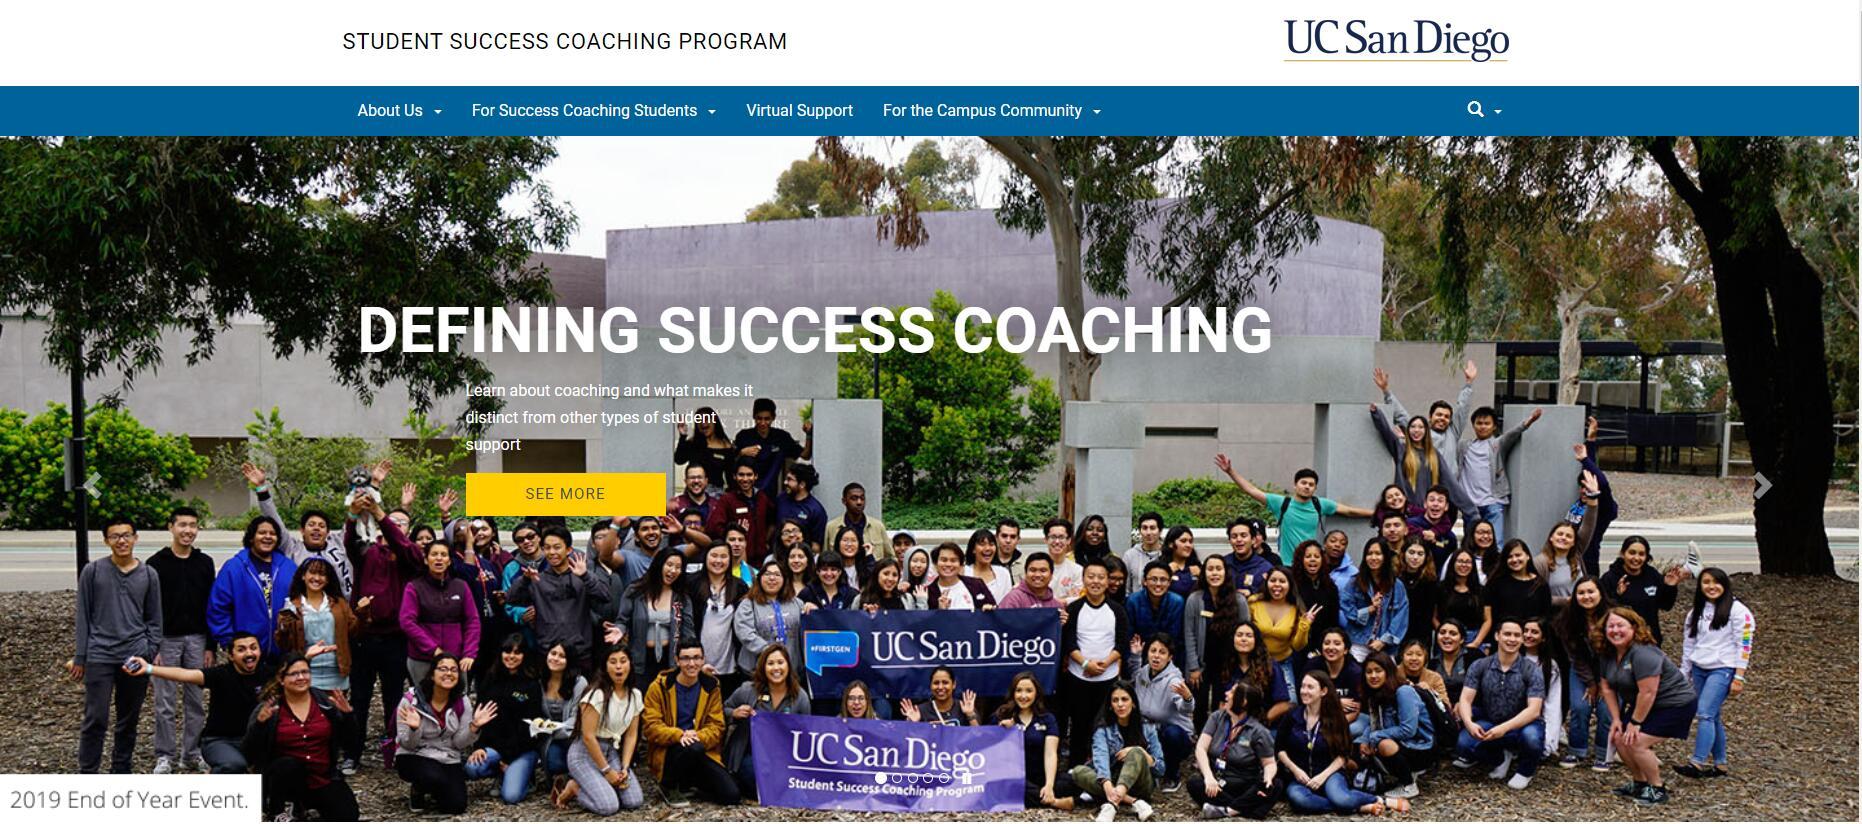 UCSD Student Success Coaching Program